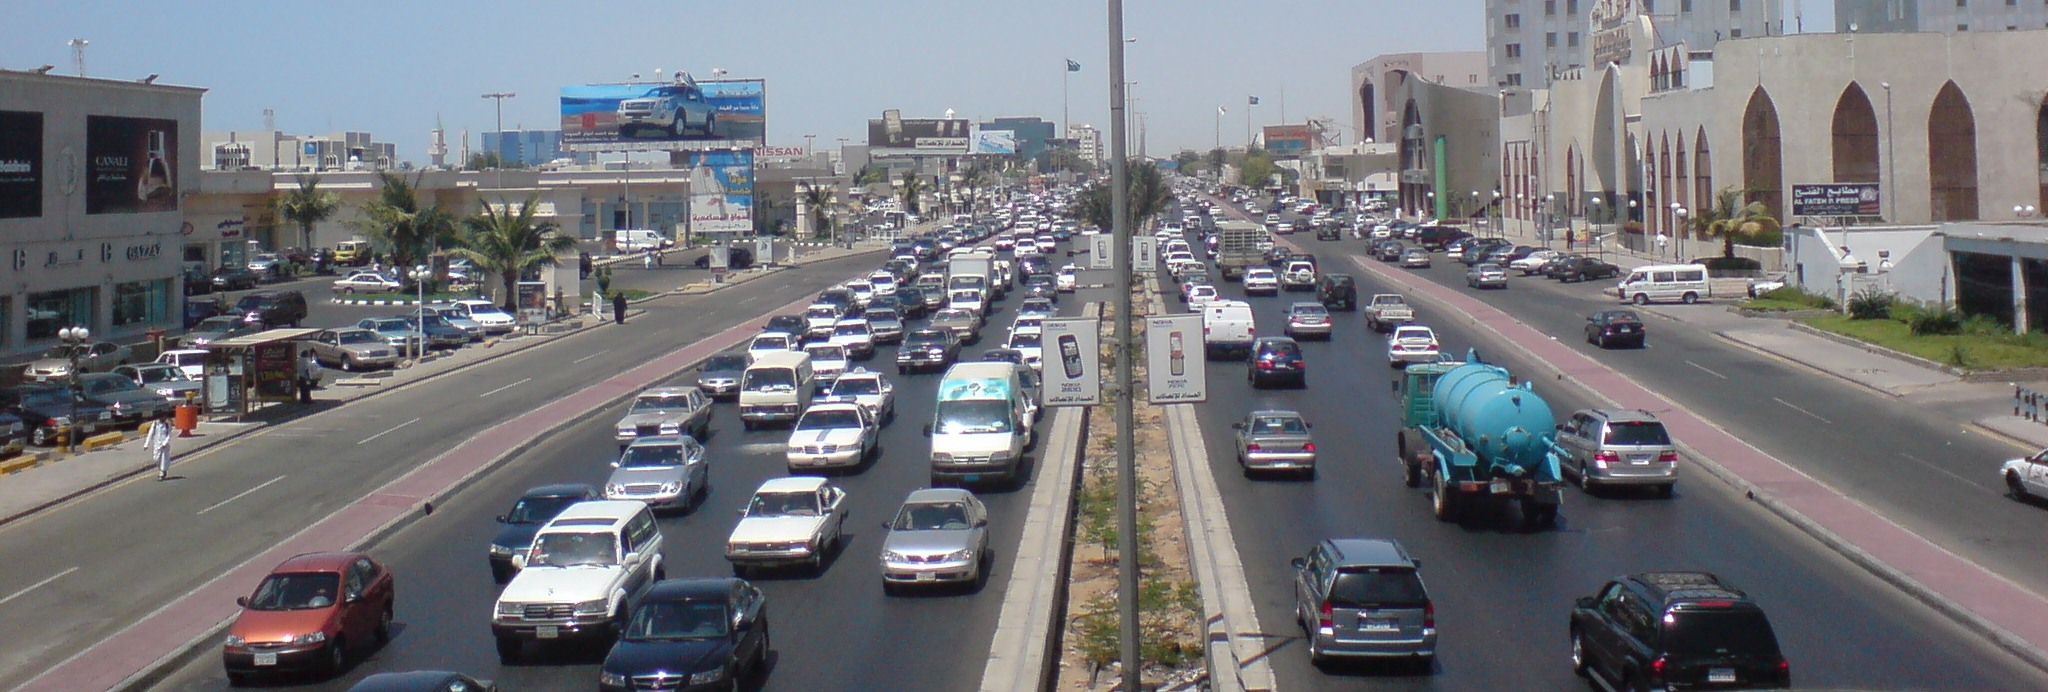 Jeddah Saudi Arabia  city photos gallery : Jeddah Saudi Arabia